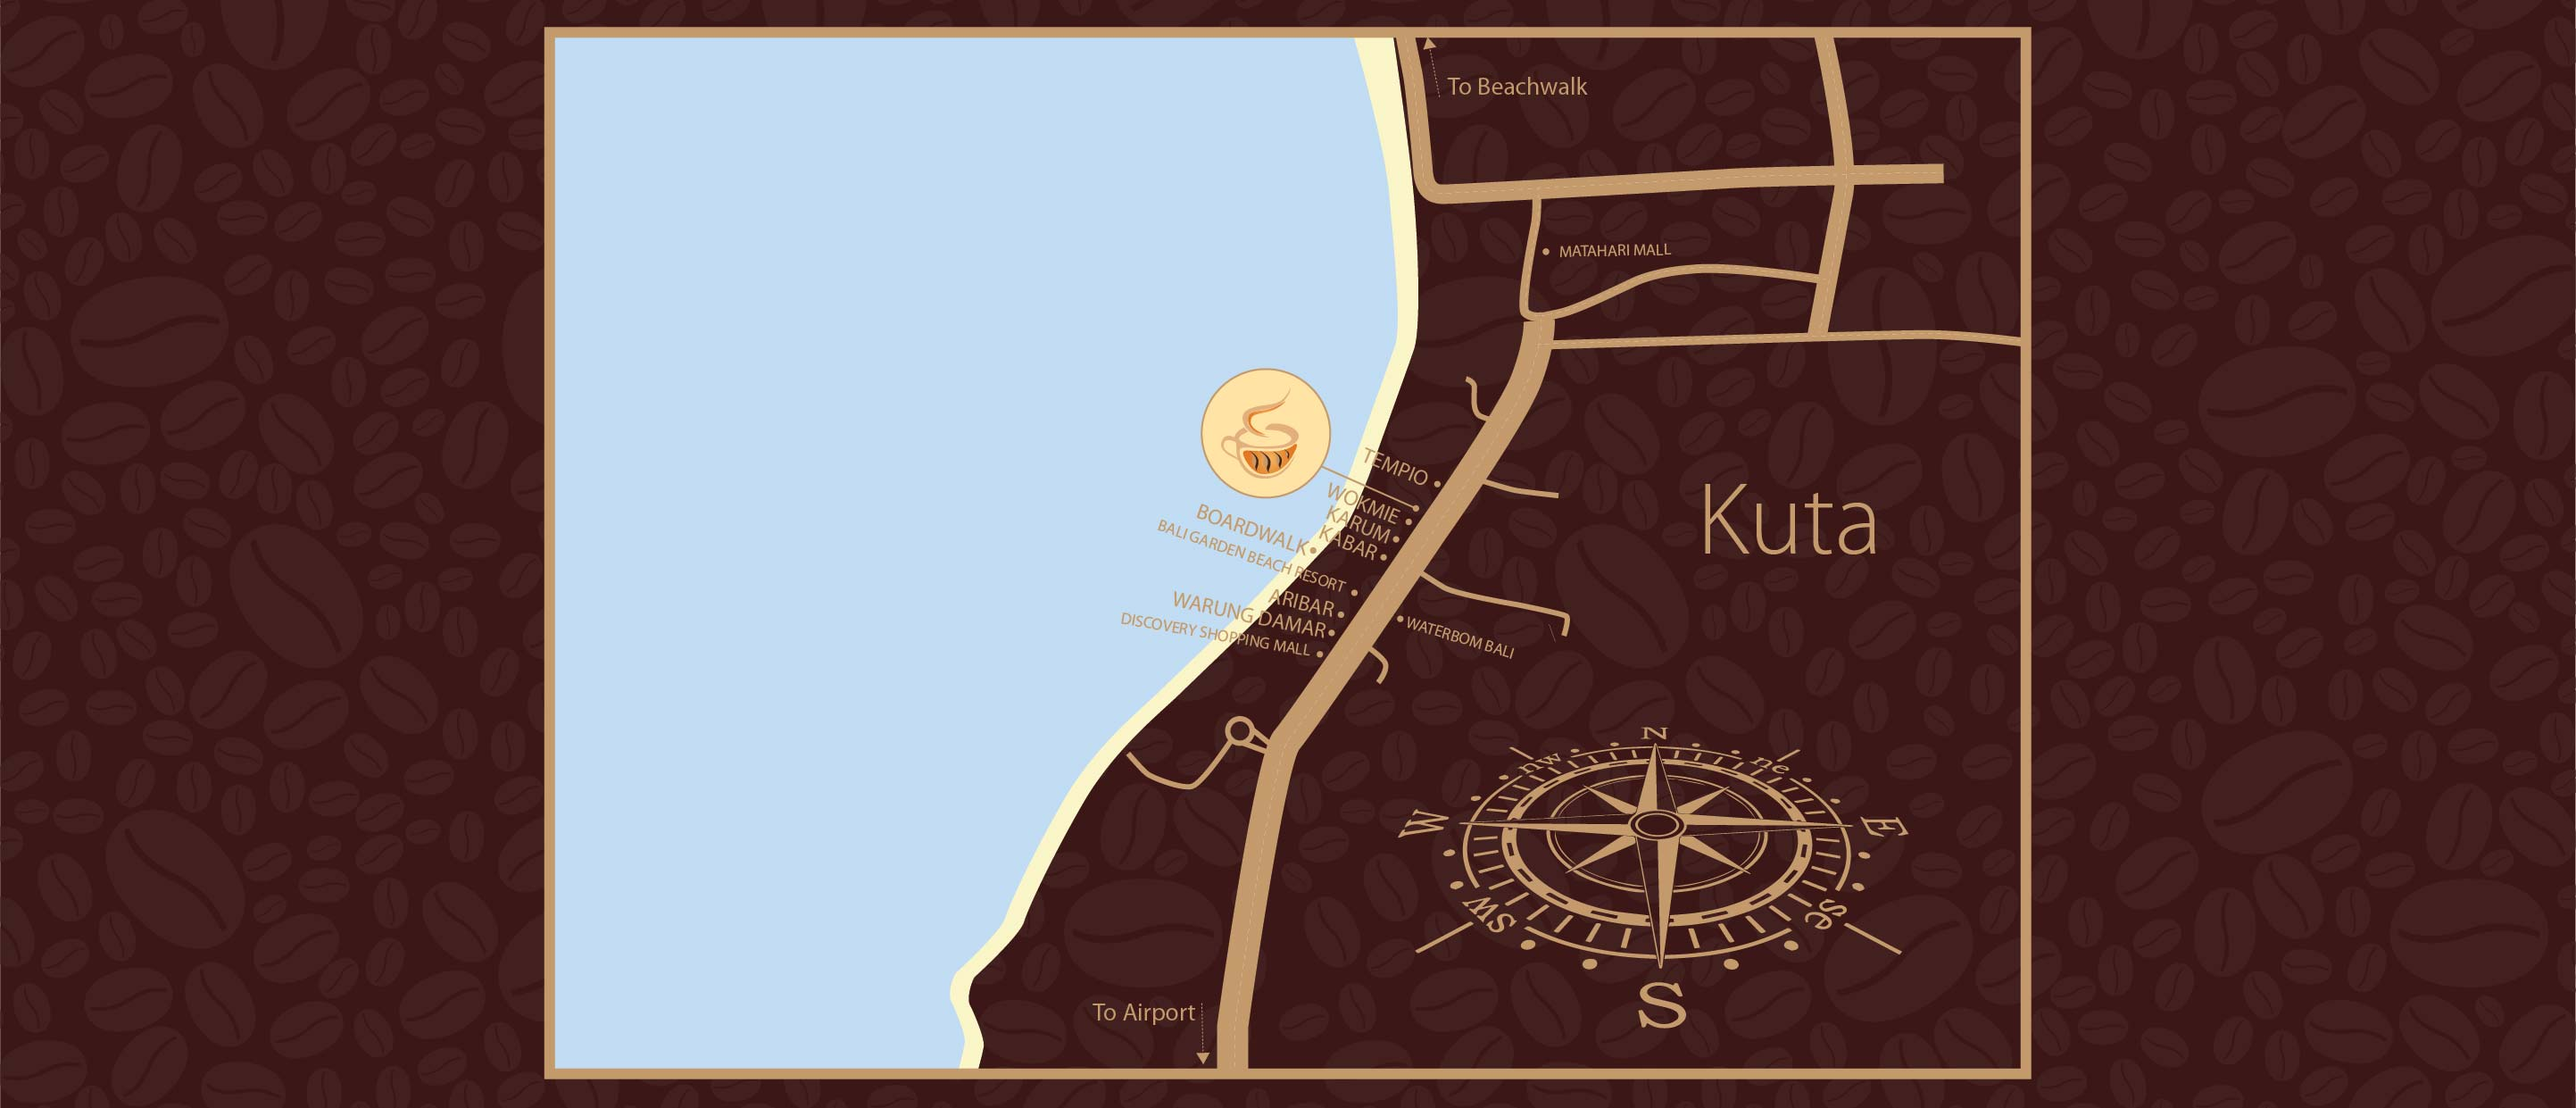 Kopi Kue Map-01